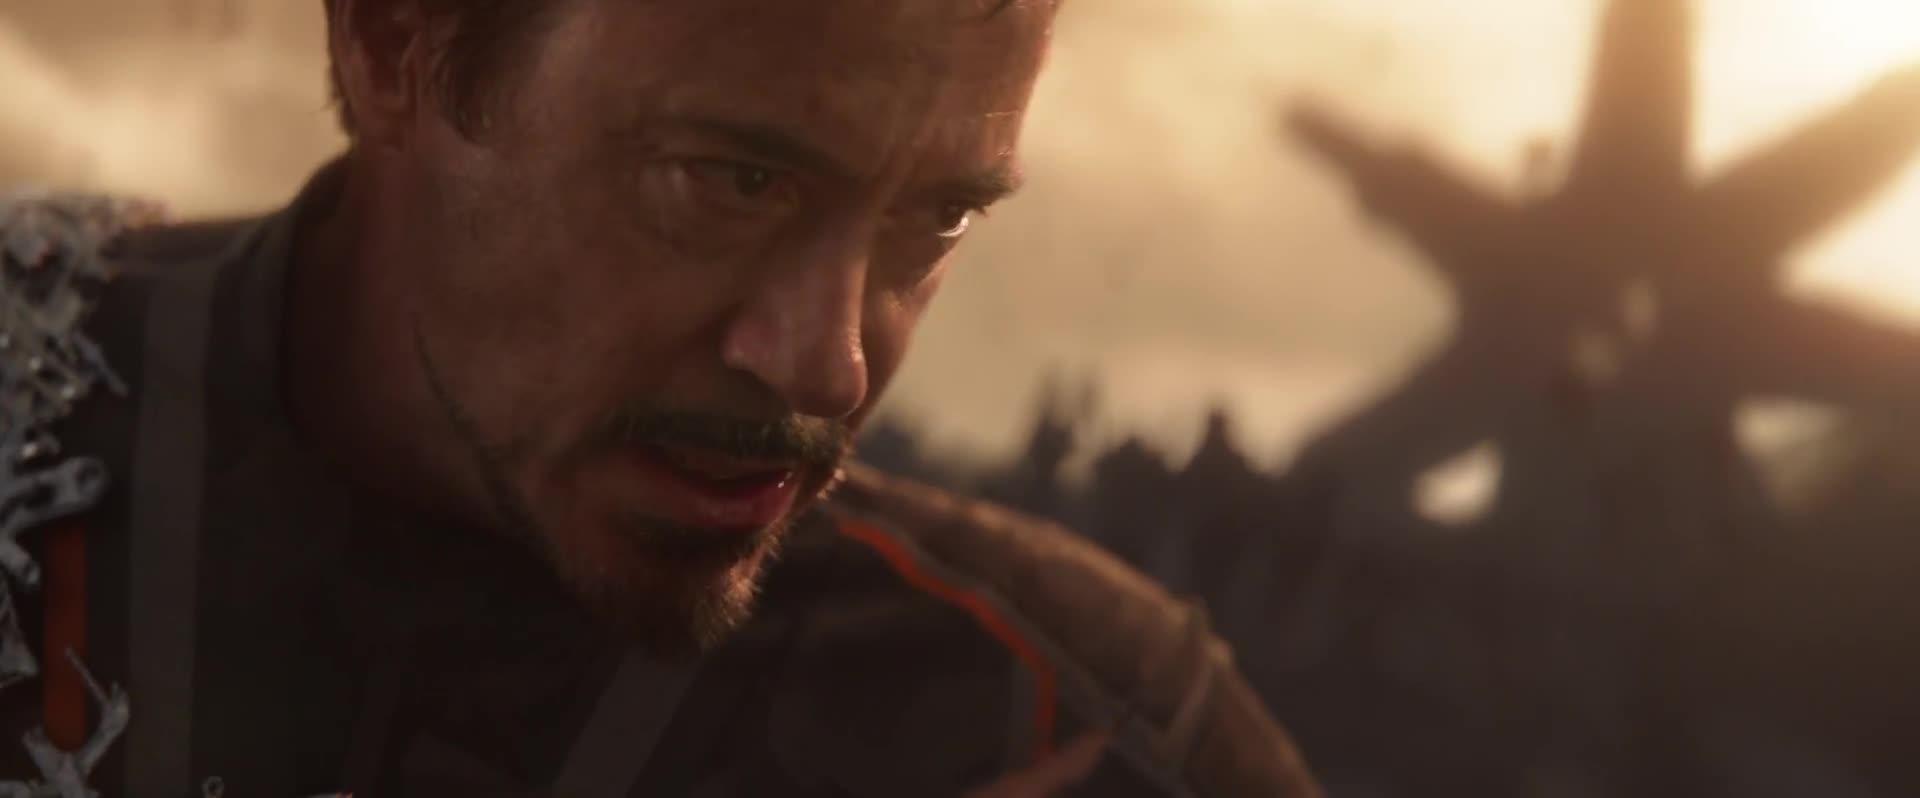 avengers, avengers infinity war, captain america, marvel, mcu, thanos, Marvel Studios' Avengers: Infinity War GIFs